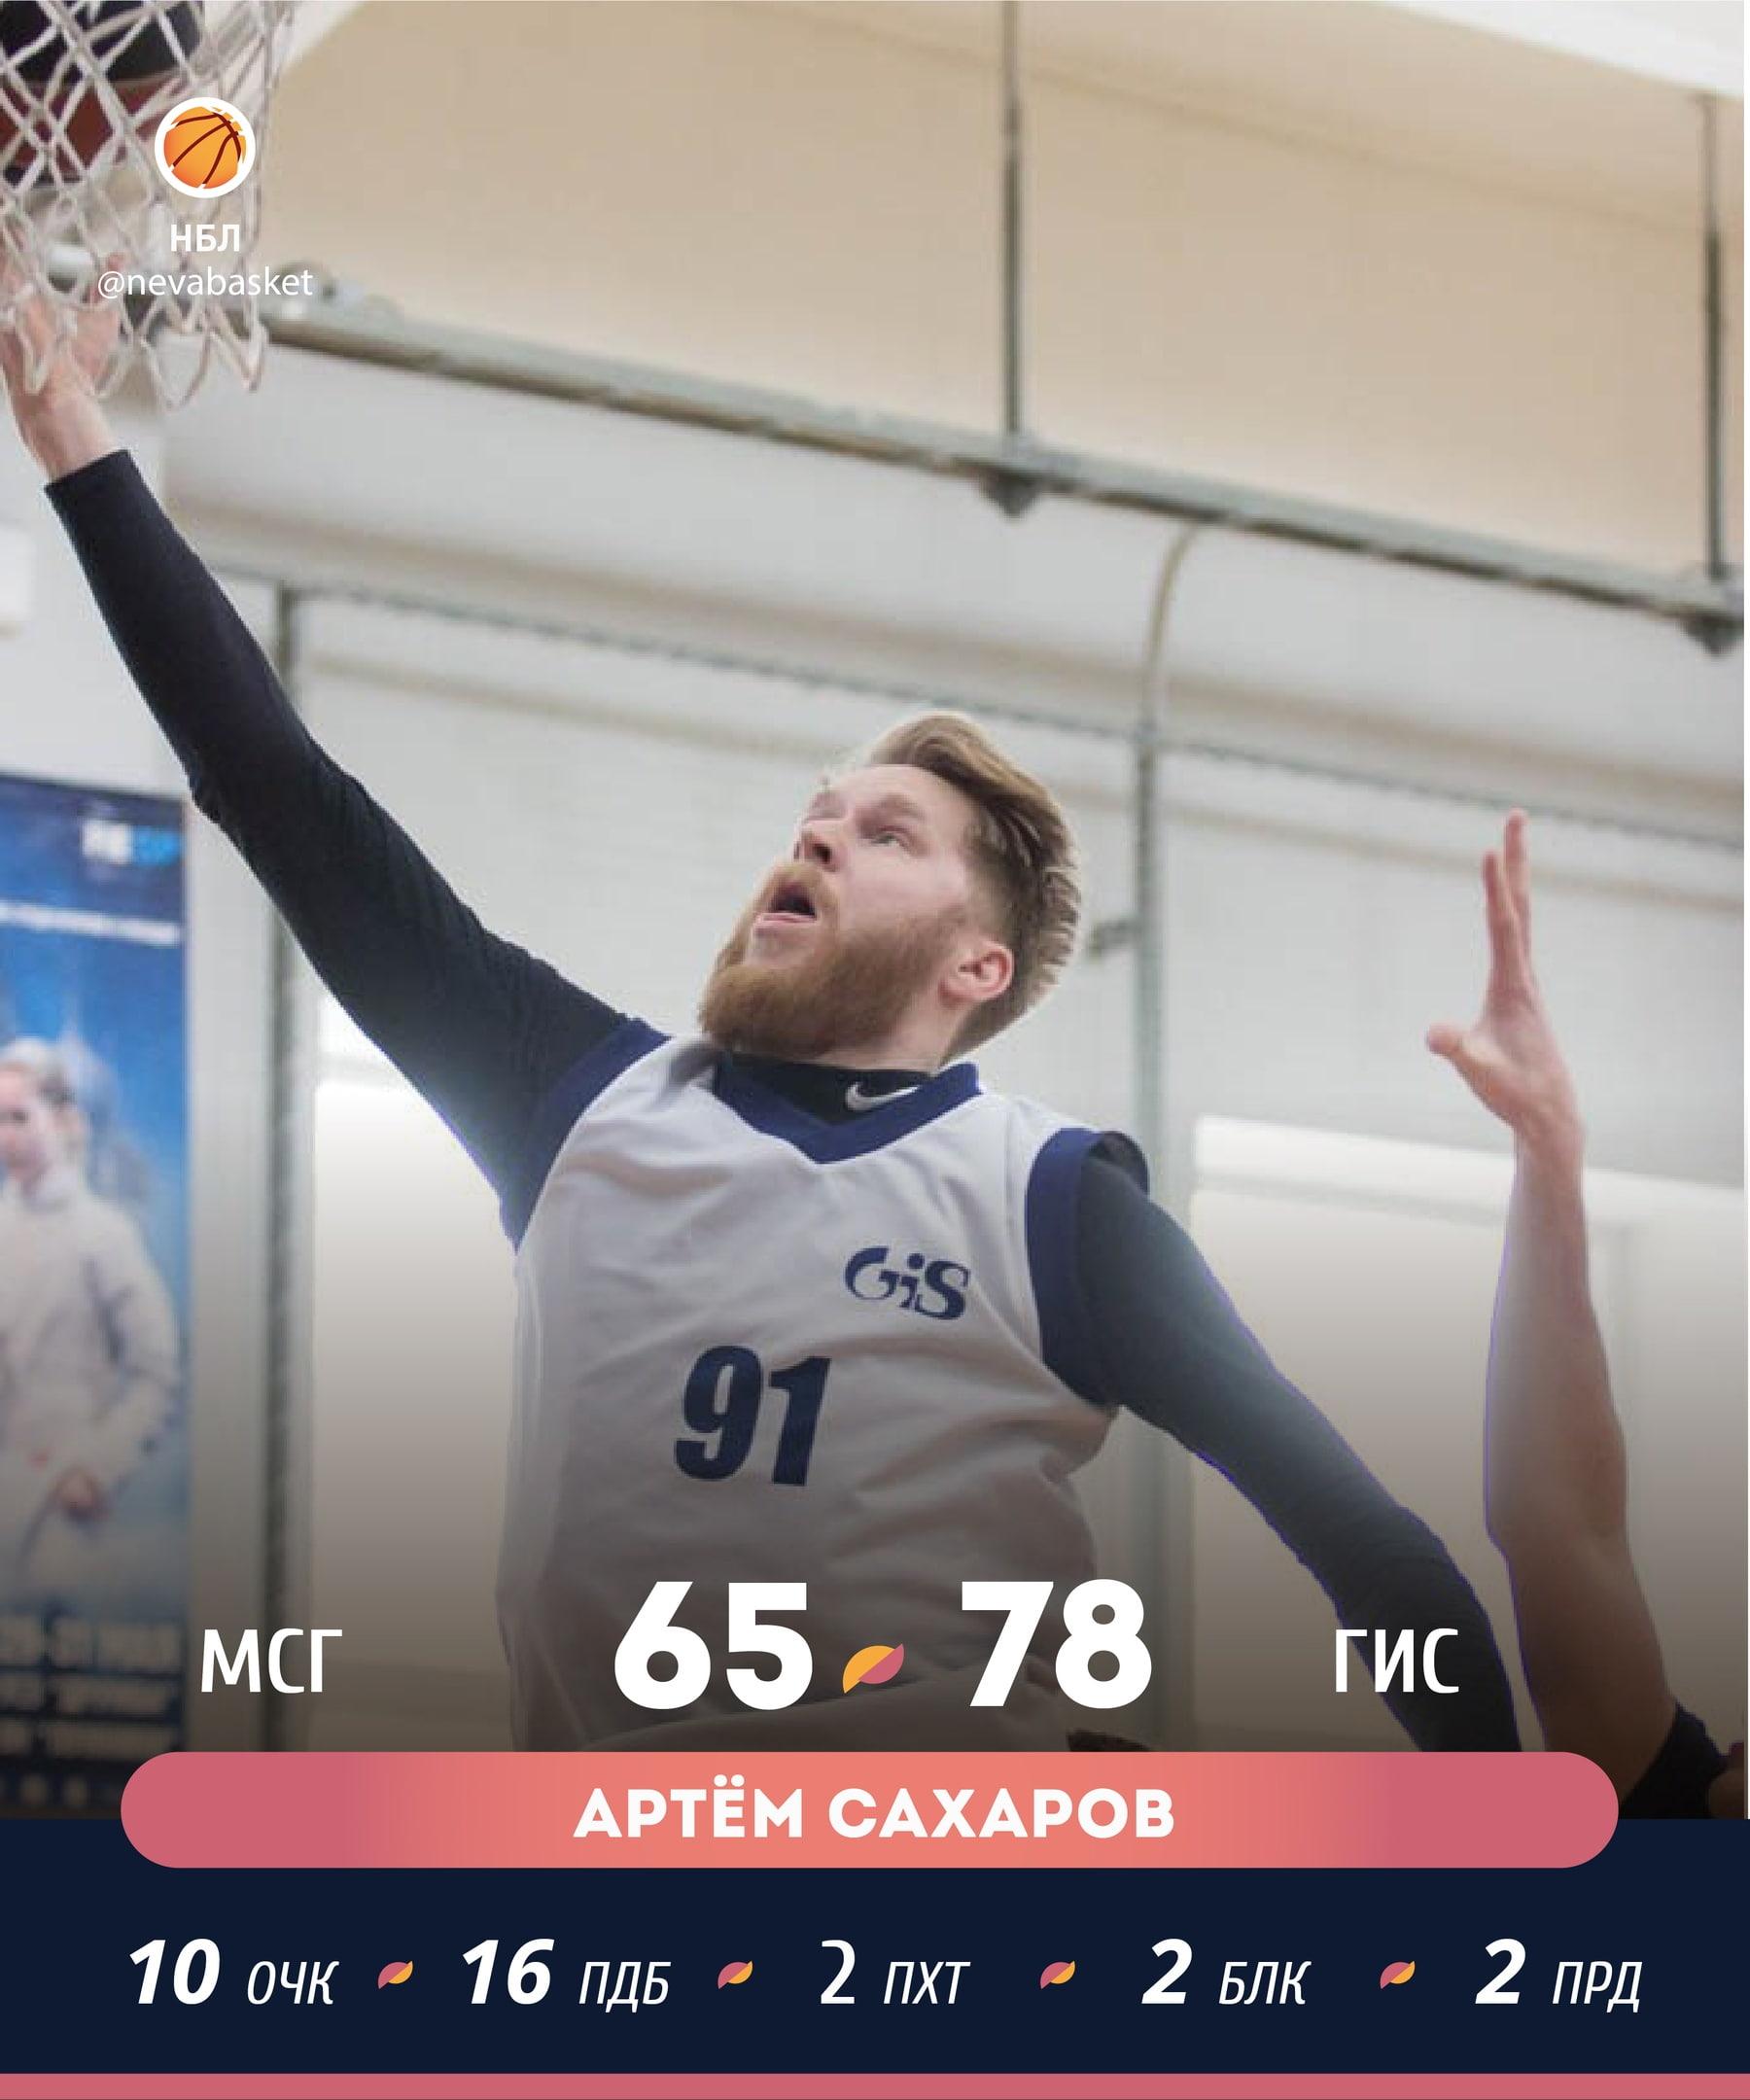 МСГ - Газиформсервис